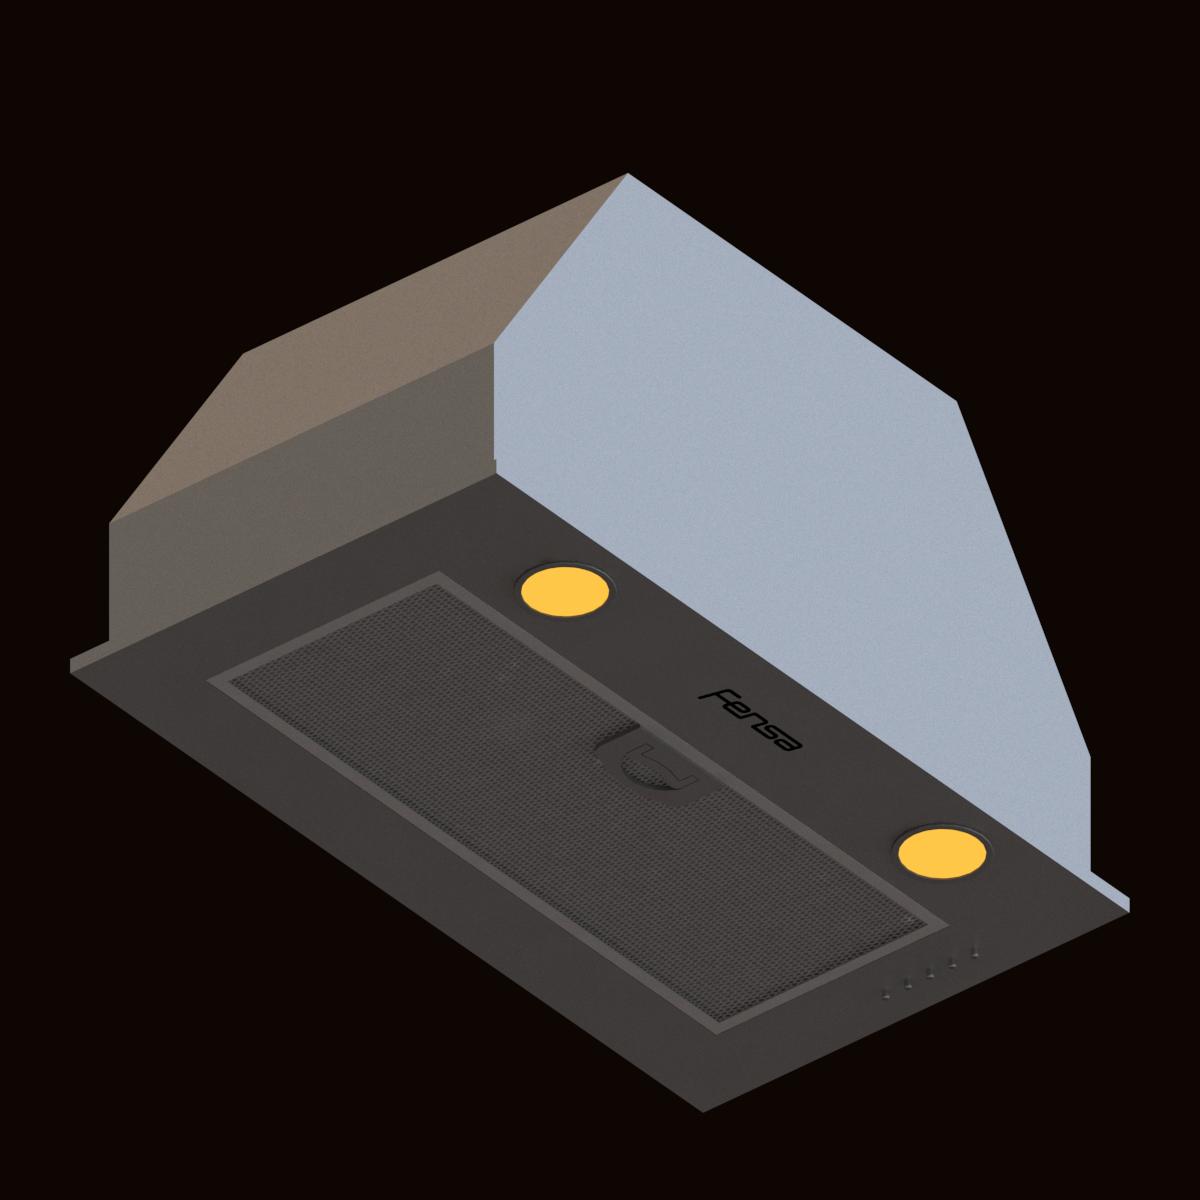 Campana integrada FX 5200